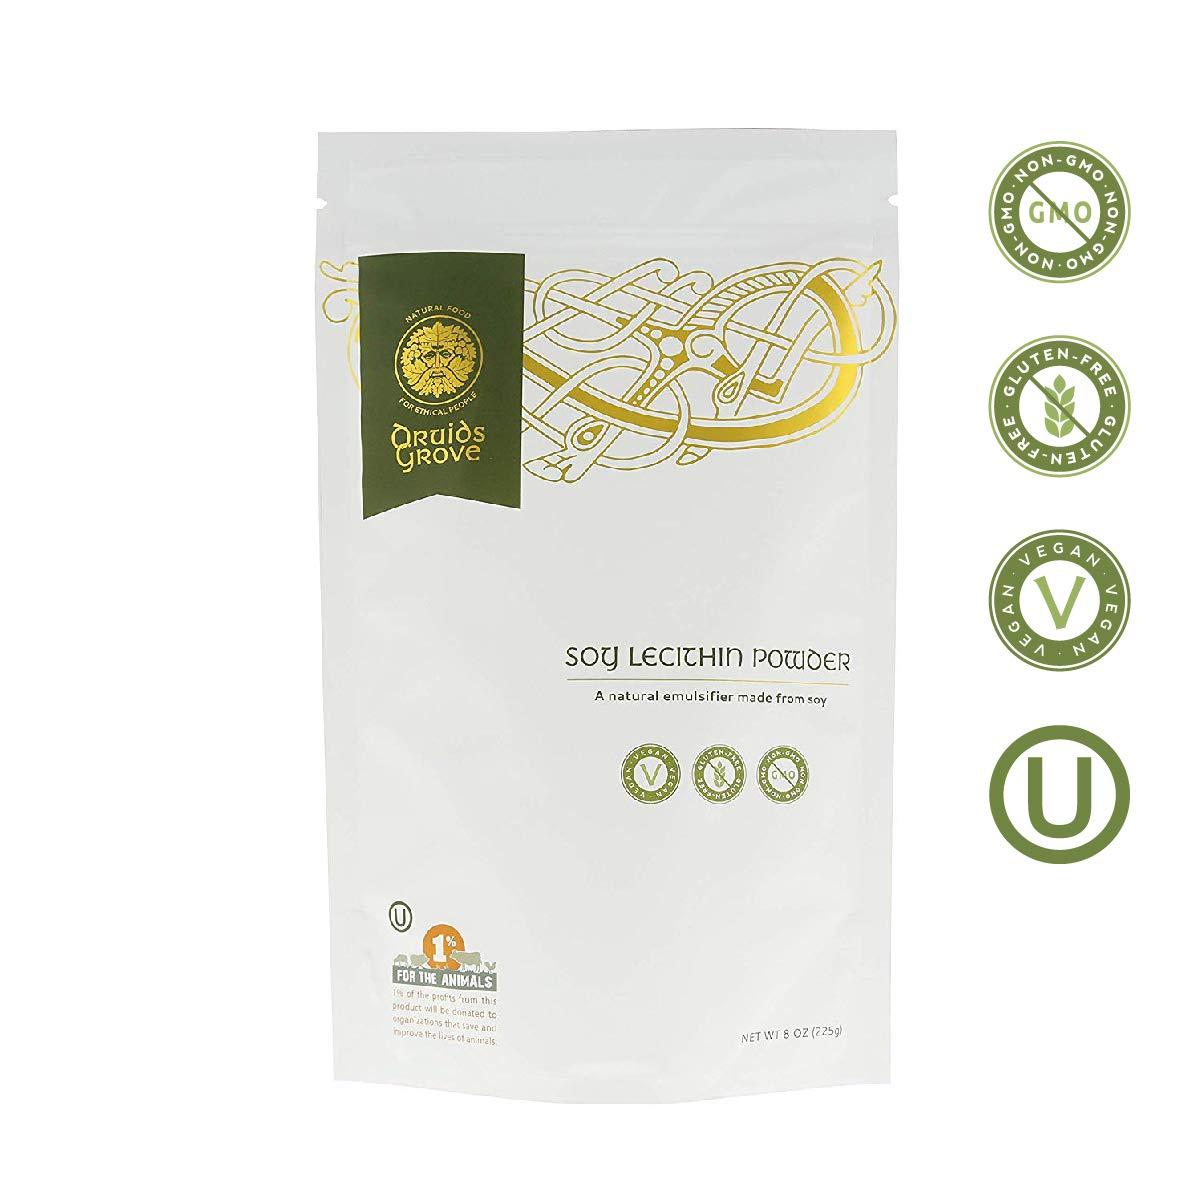 Druids Grove Refined Sodium Alginate ☮ Vegan ⊘ Non-GMO ❤ Gluten-Free ✡ OU Kosher Certified - 8 oz.